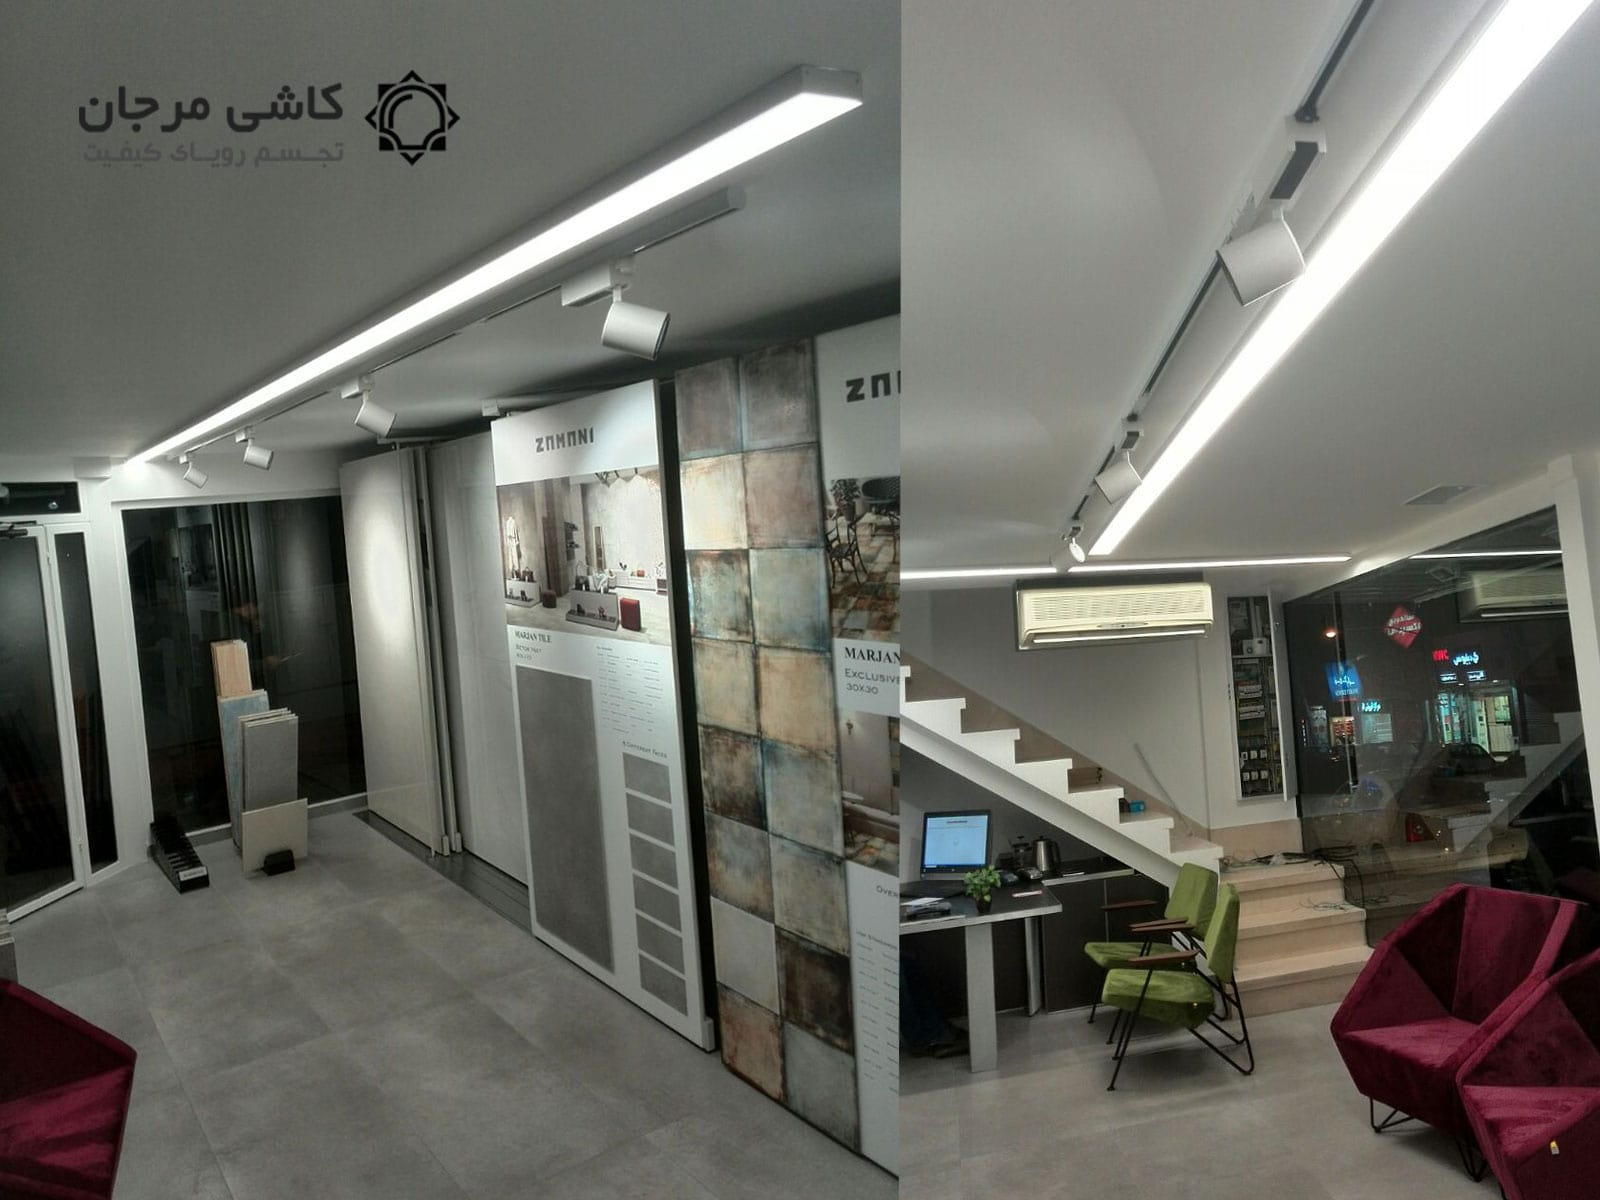 پروژه نورپردازی   طراحی نورپردازی   نورپردازی گالری   شرکت نورپردازی   چراغ ریلی   نورپردازی آتلیه   نورخطی   لامپ خطی   پروژههای نورپردازی و روشنایی